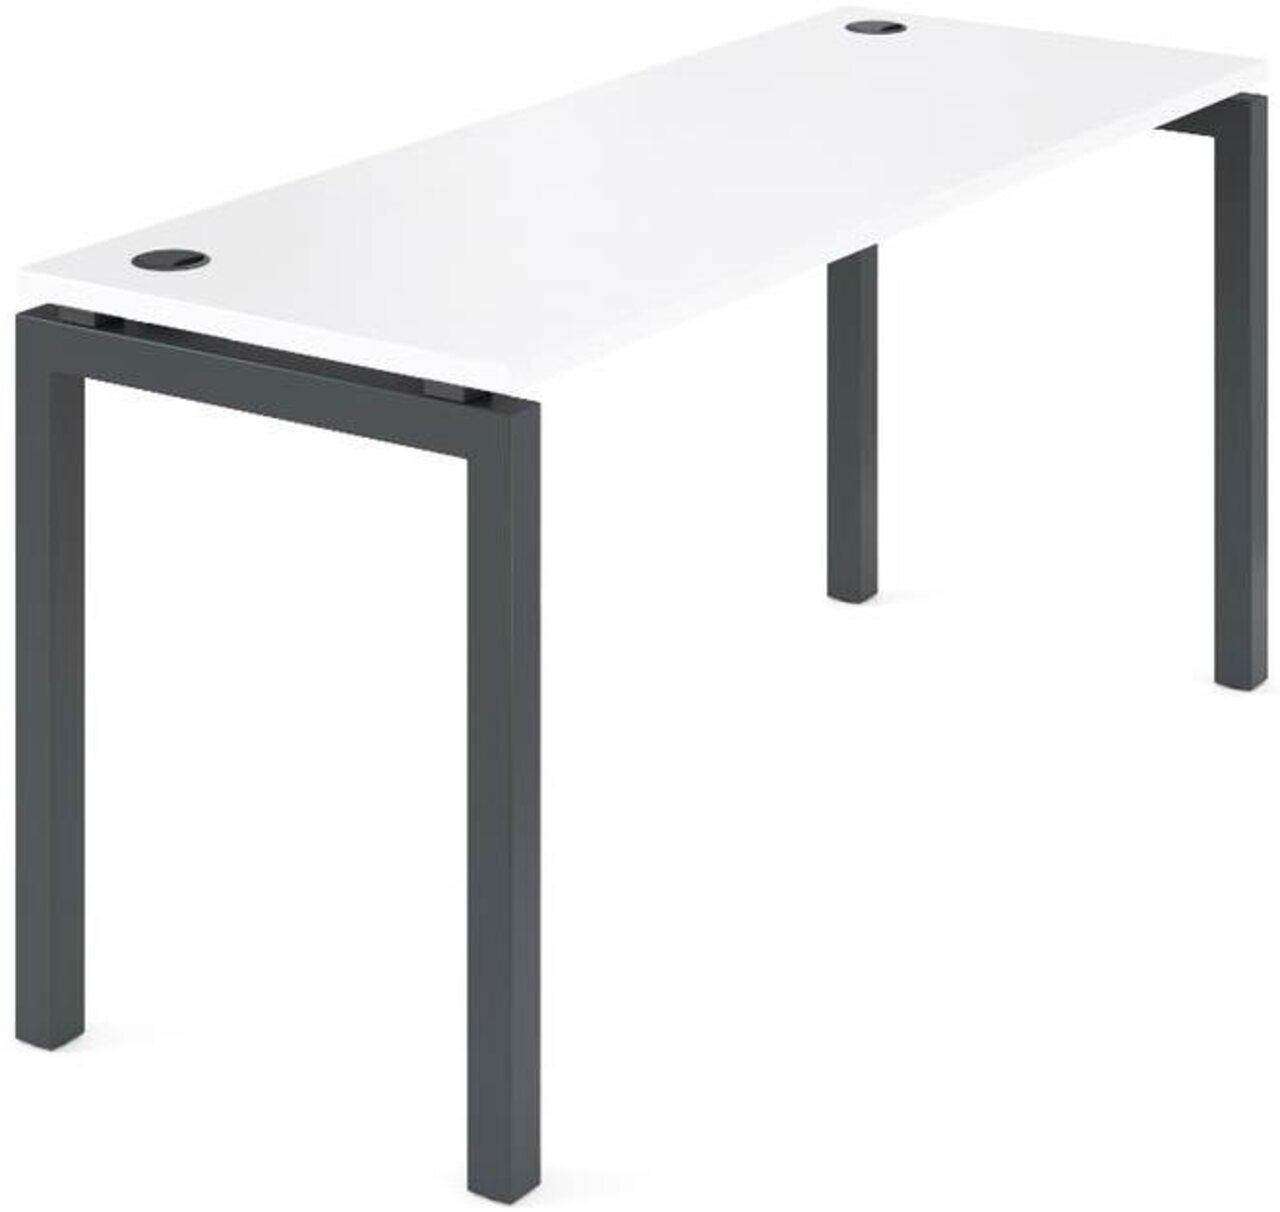 Стол на металлокаркасе  Арго 160x60x76 - фото 5